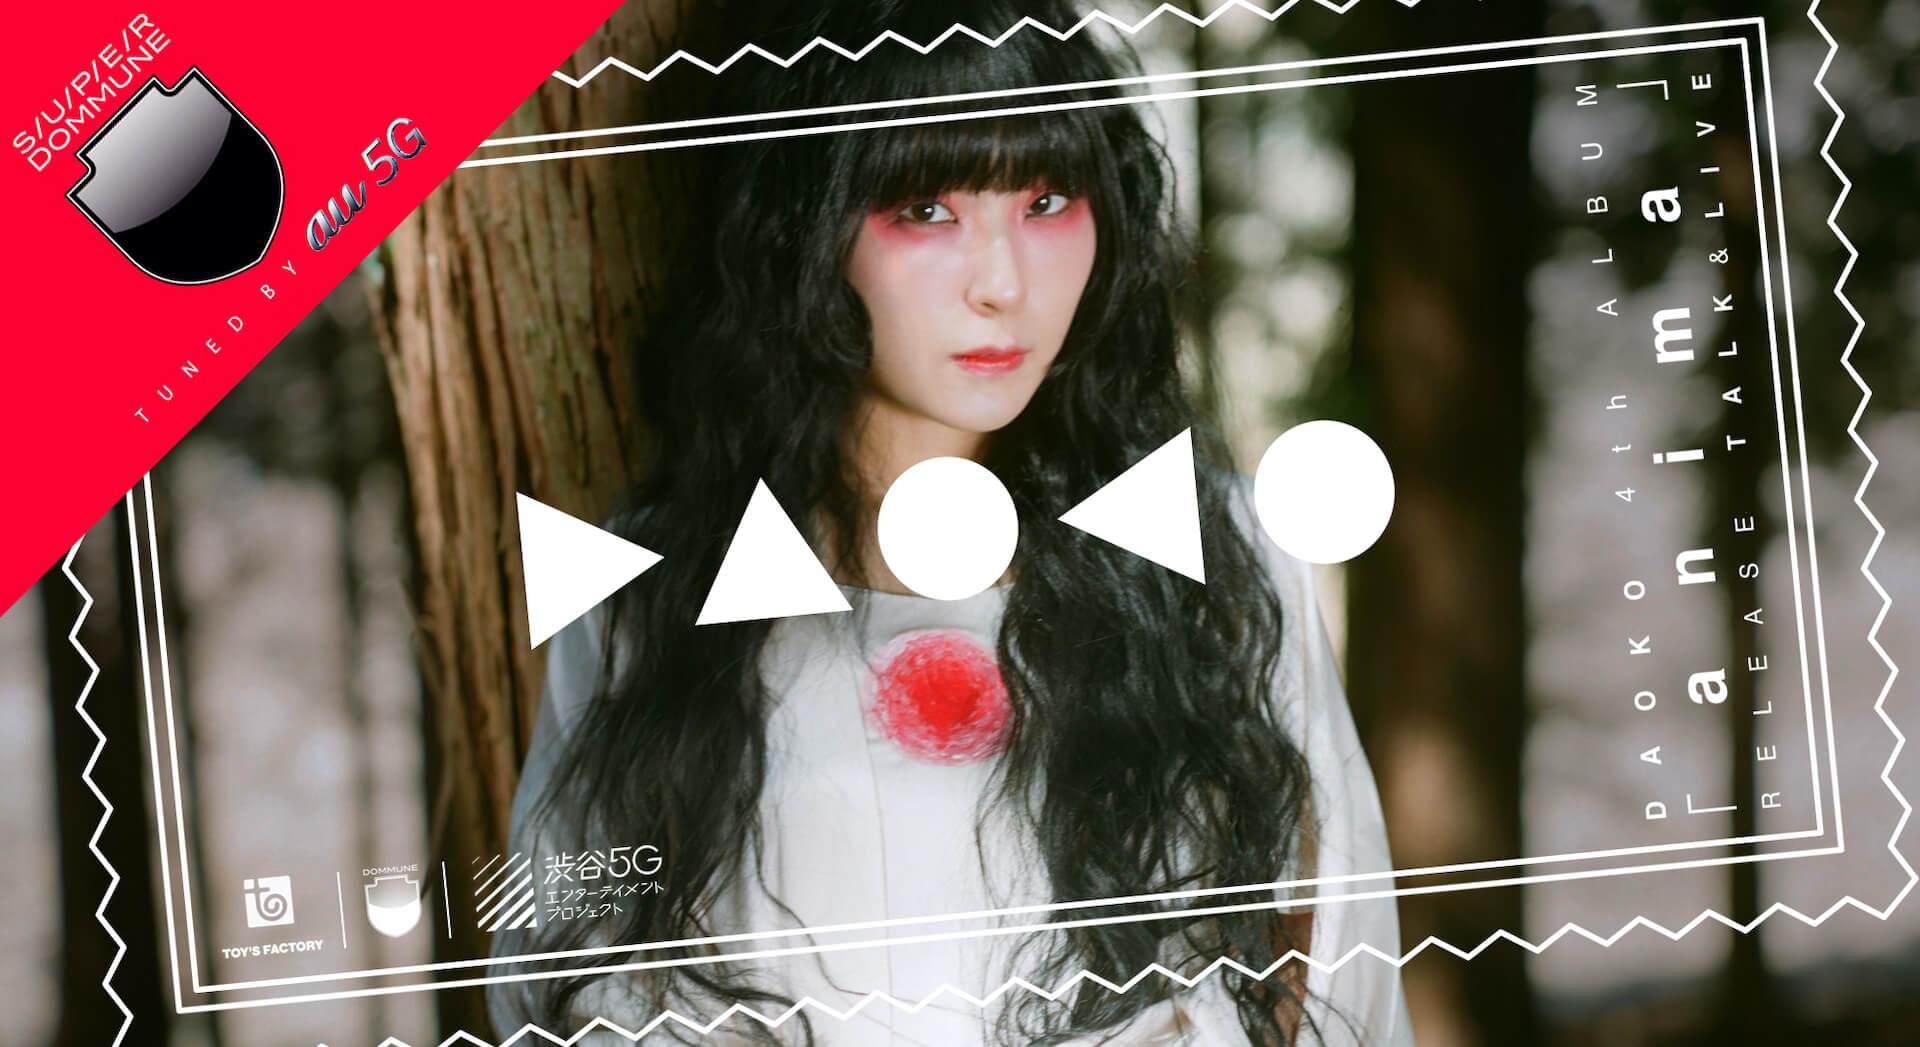 SUPER DOMMUNEにて配信されるDAOKOの4thアルバム『anima』リリース記念ARライブの詳細が公開! music200623_daoko_dommune_01